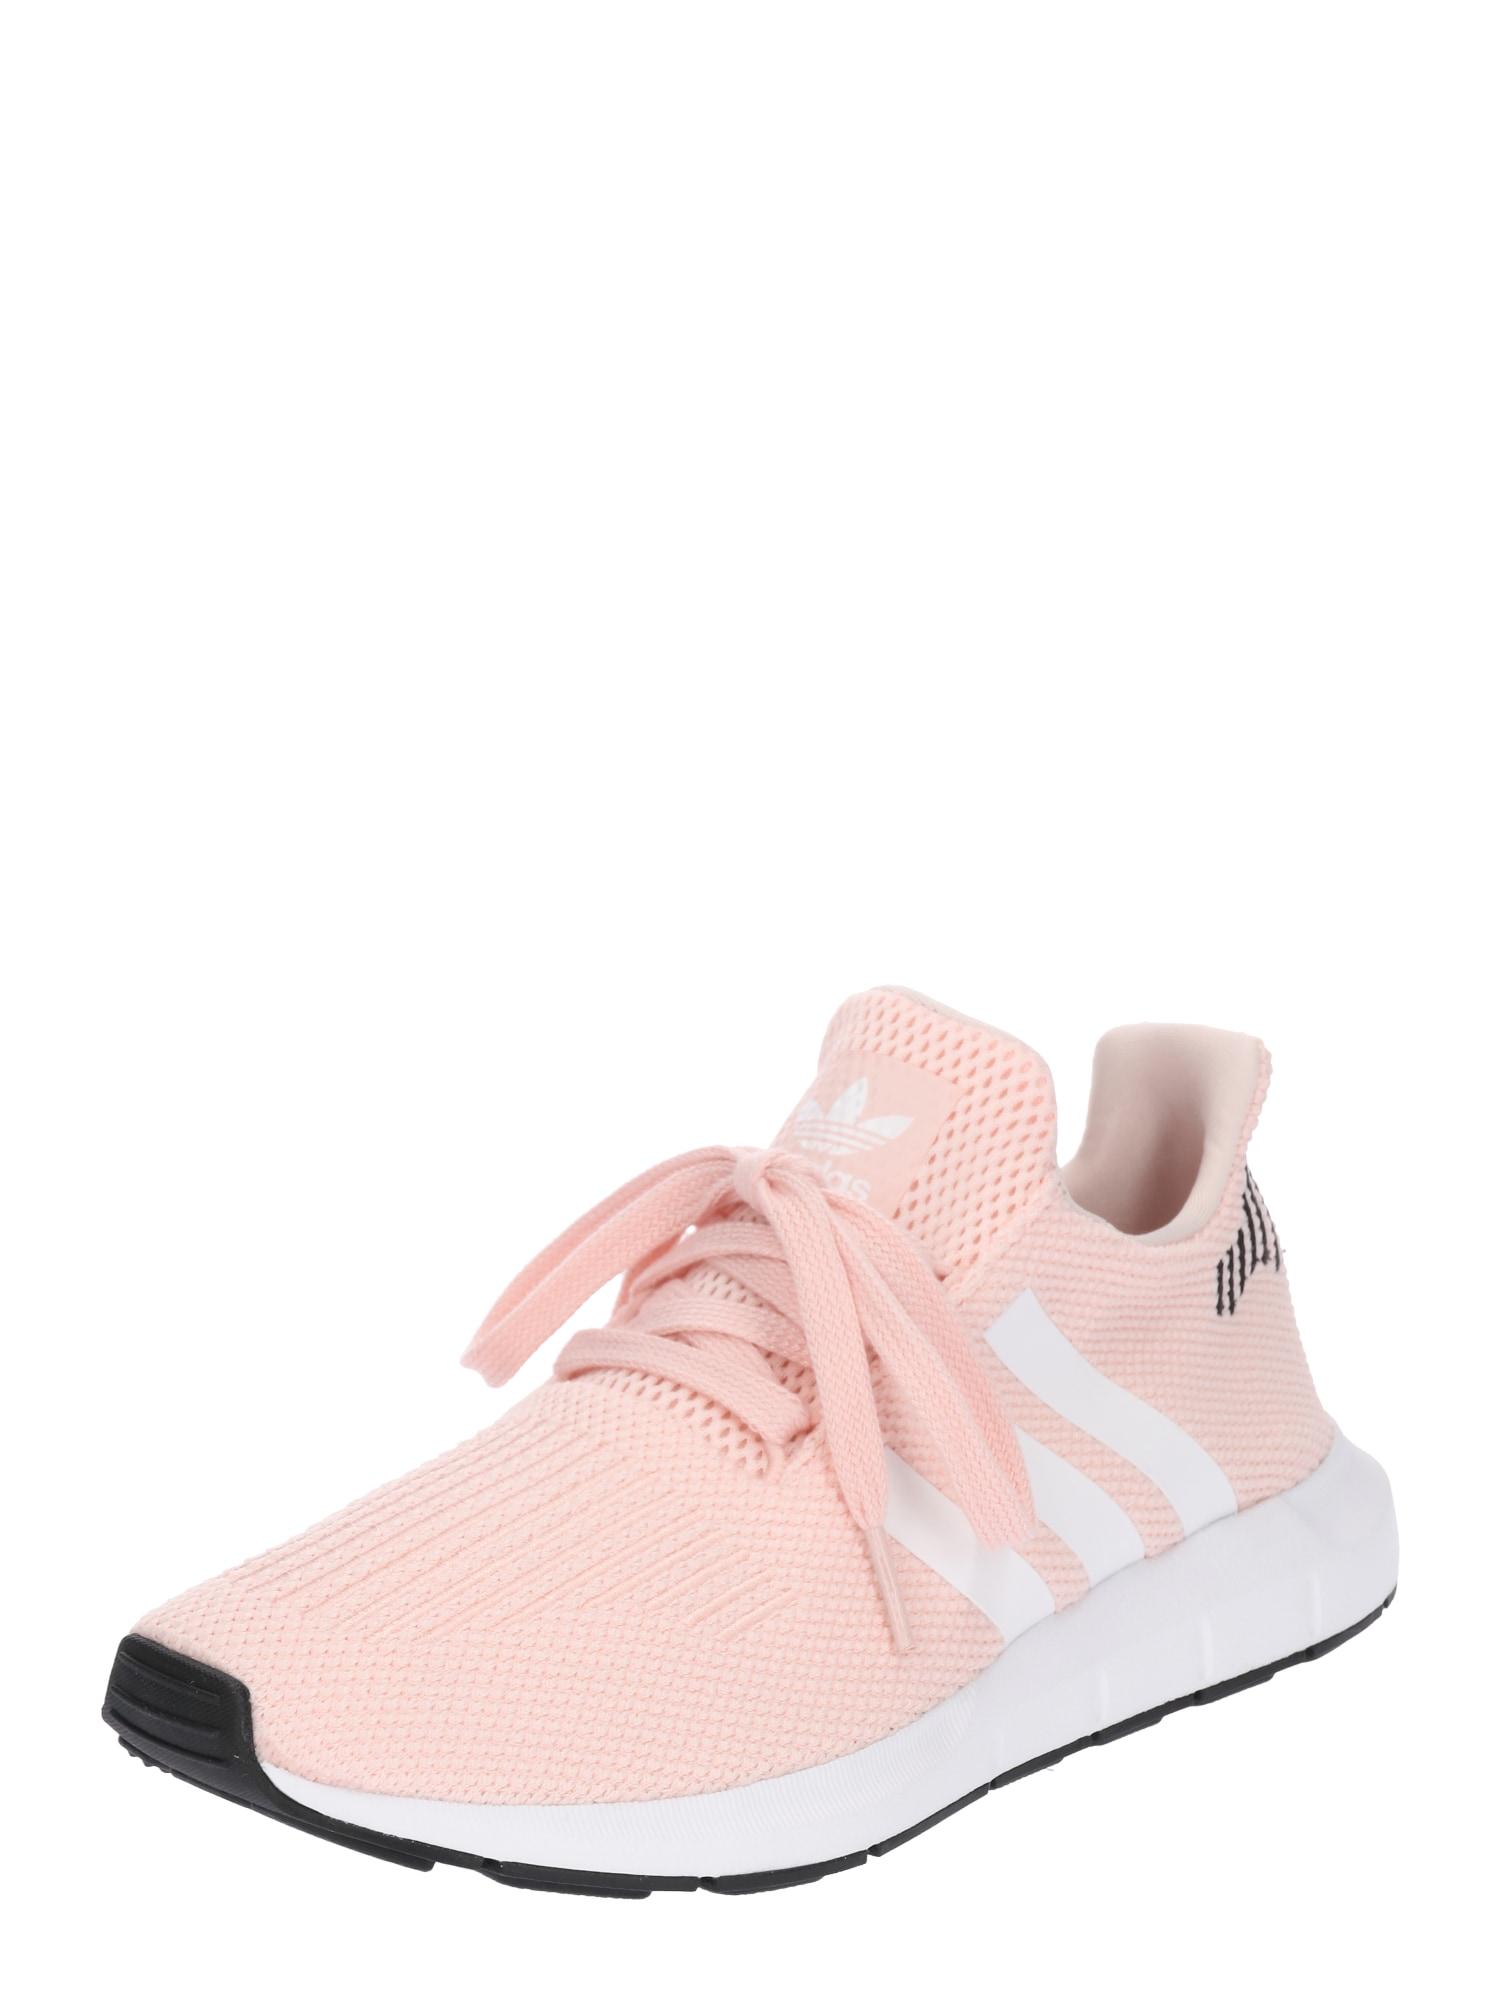 ADIDAS ORIGINALS, Dames Sneakers laag 'SWIFT RUN', rosé